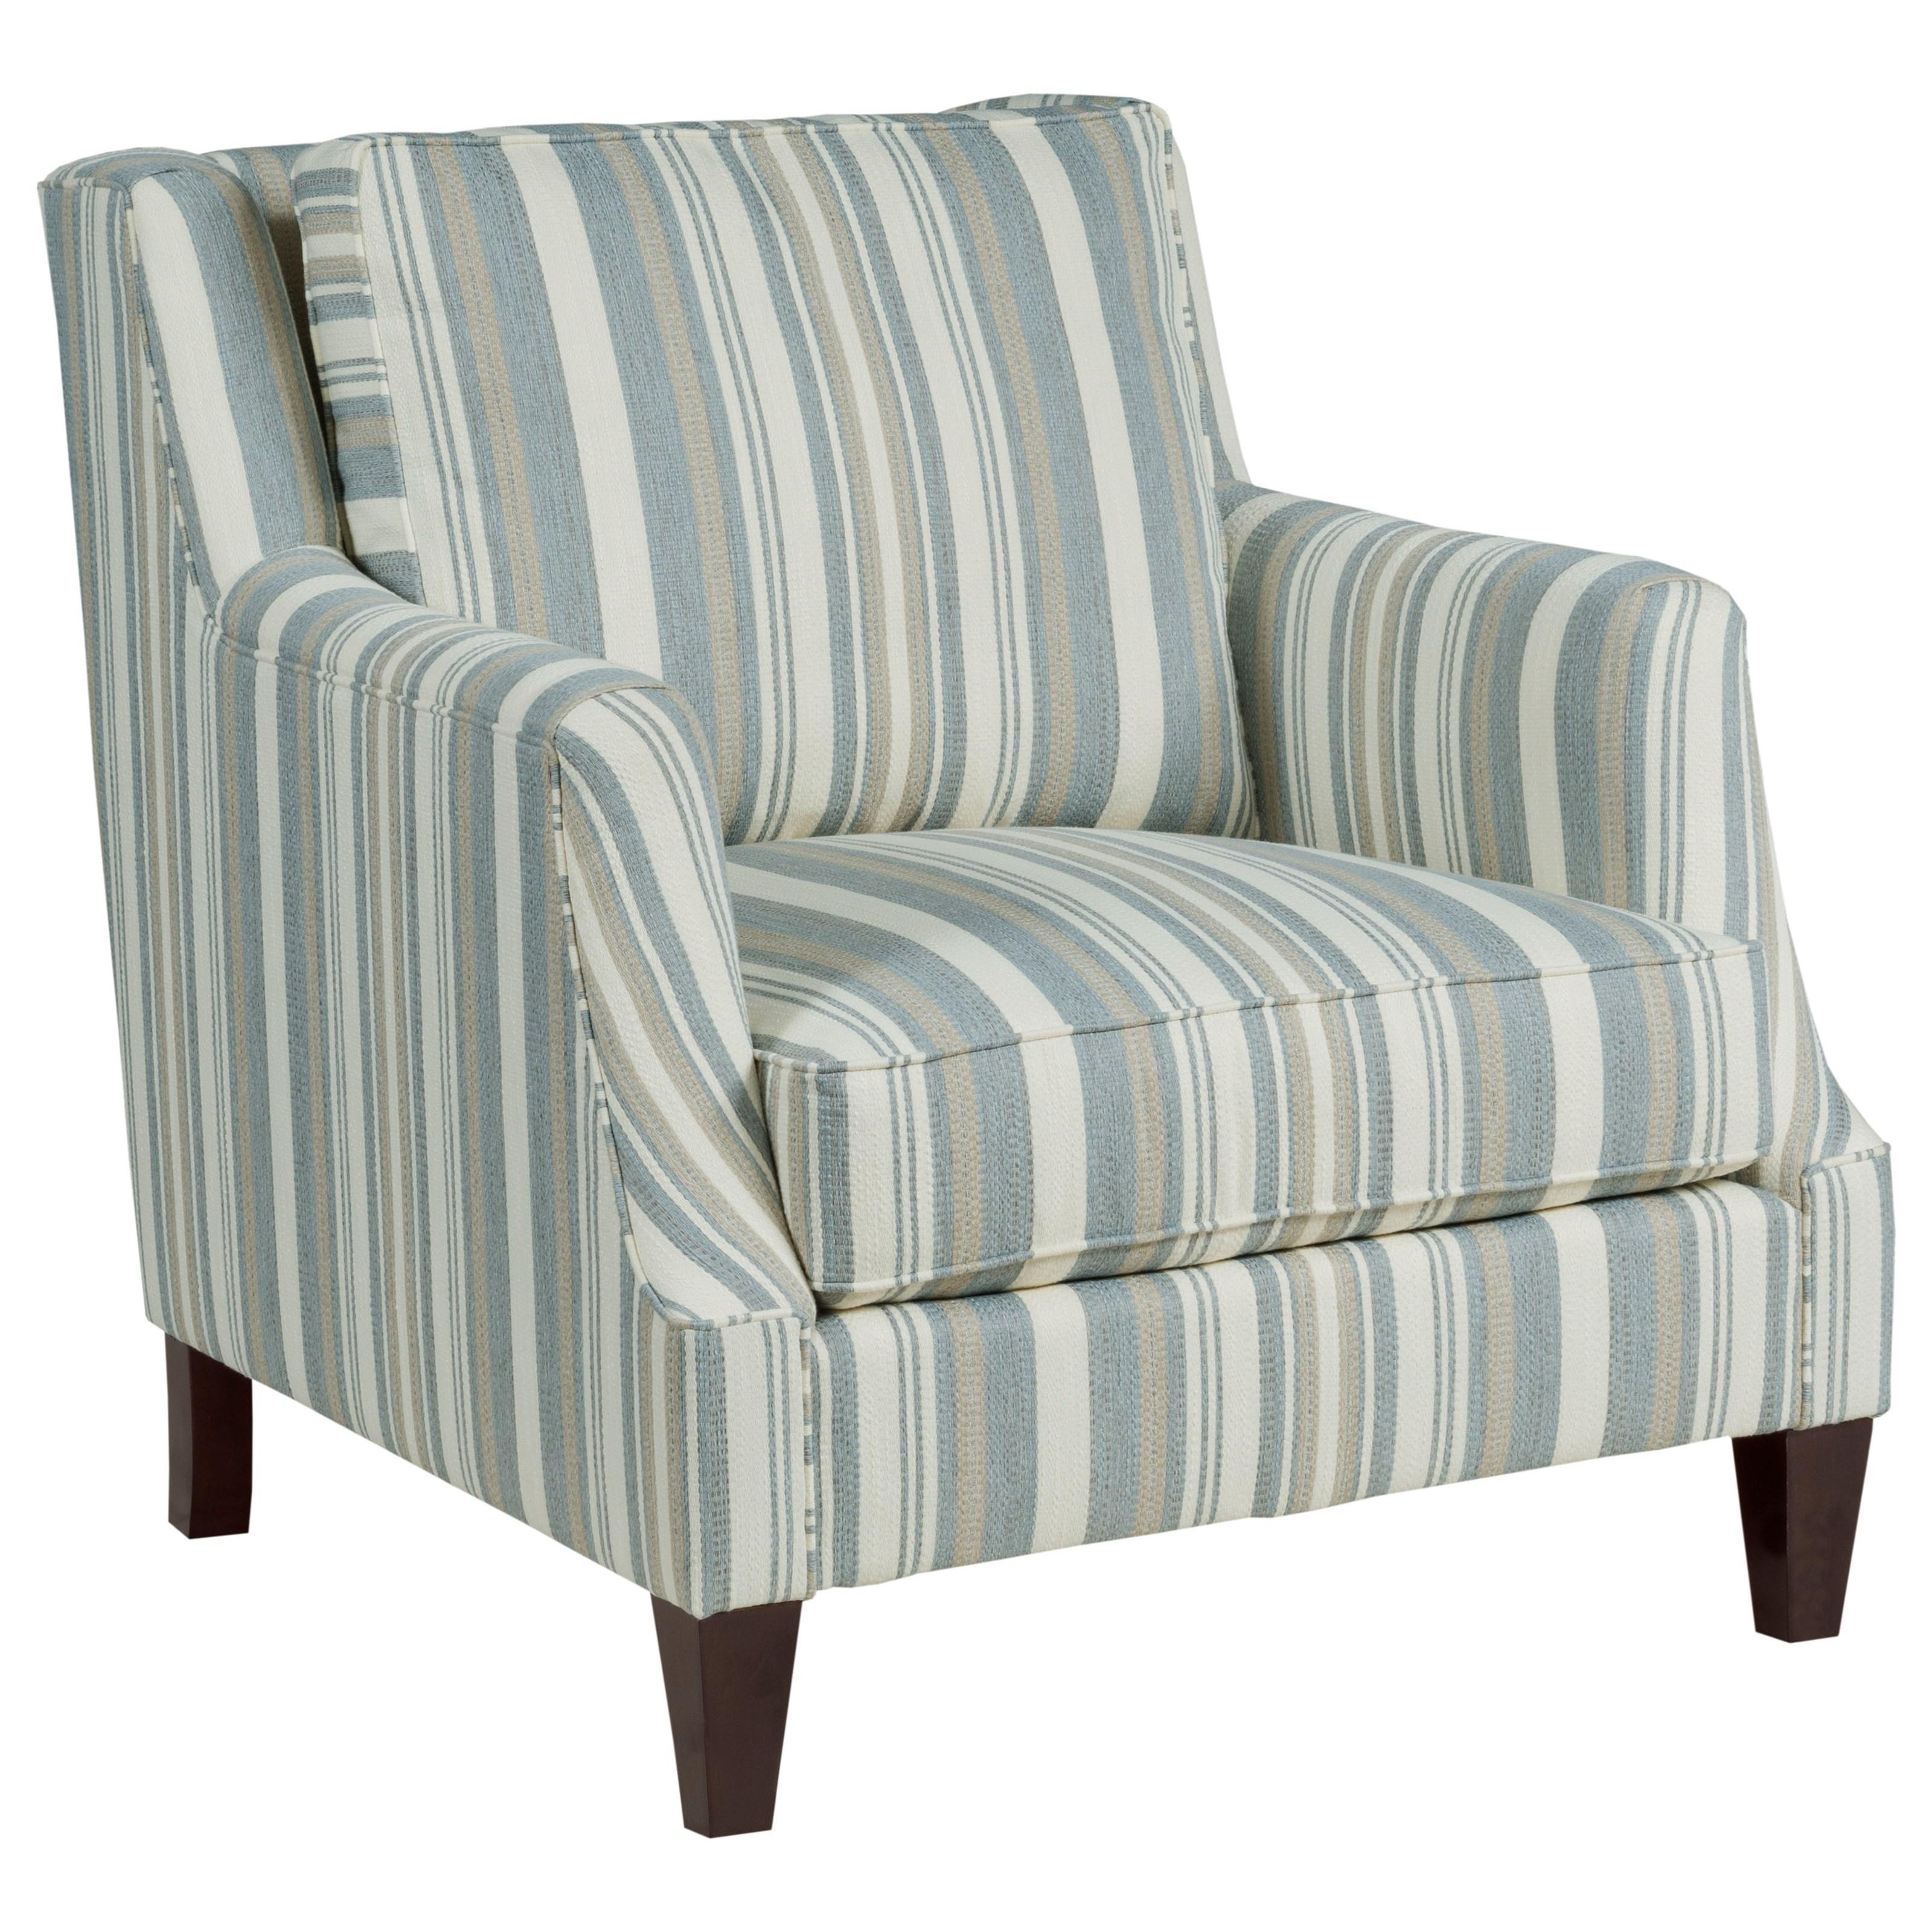 Vivian Vivian Chair by Kincaid Furniture at Johnny Janosik